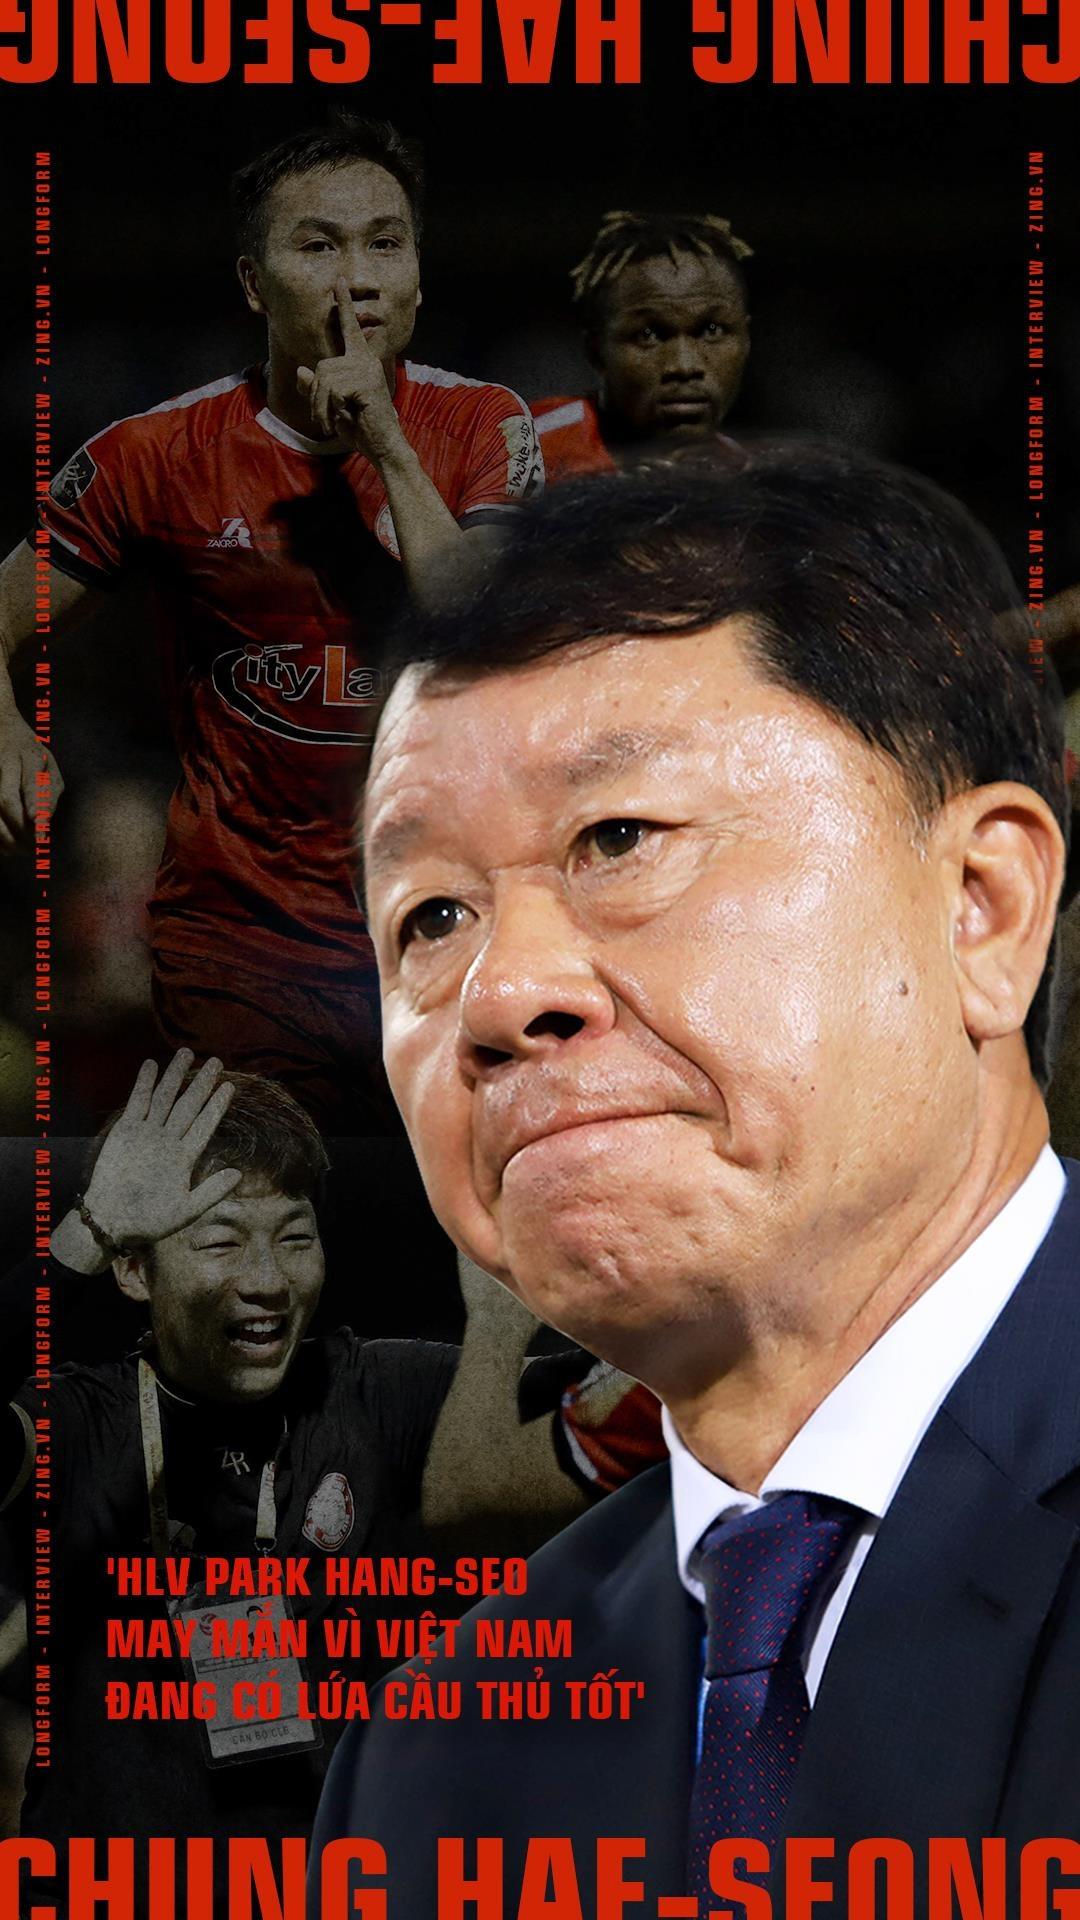 'HLV Park Hang-seo may man vi Viet Nam dang co lua cau thu tot' hinh anh 1